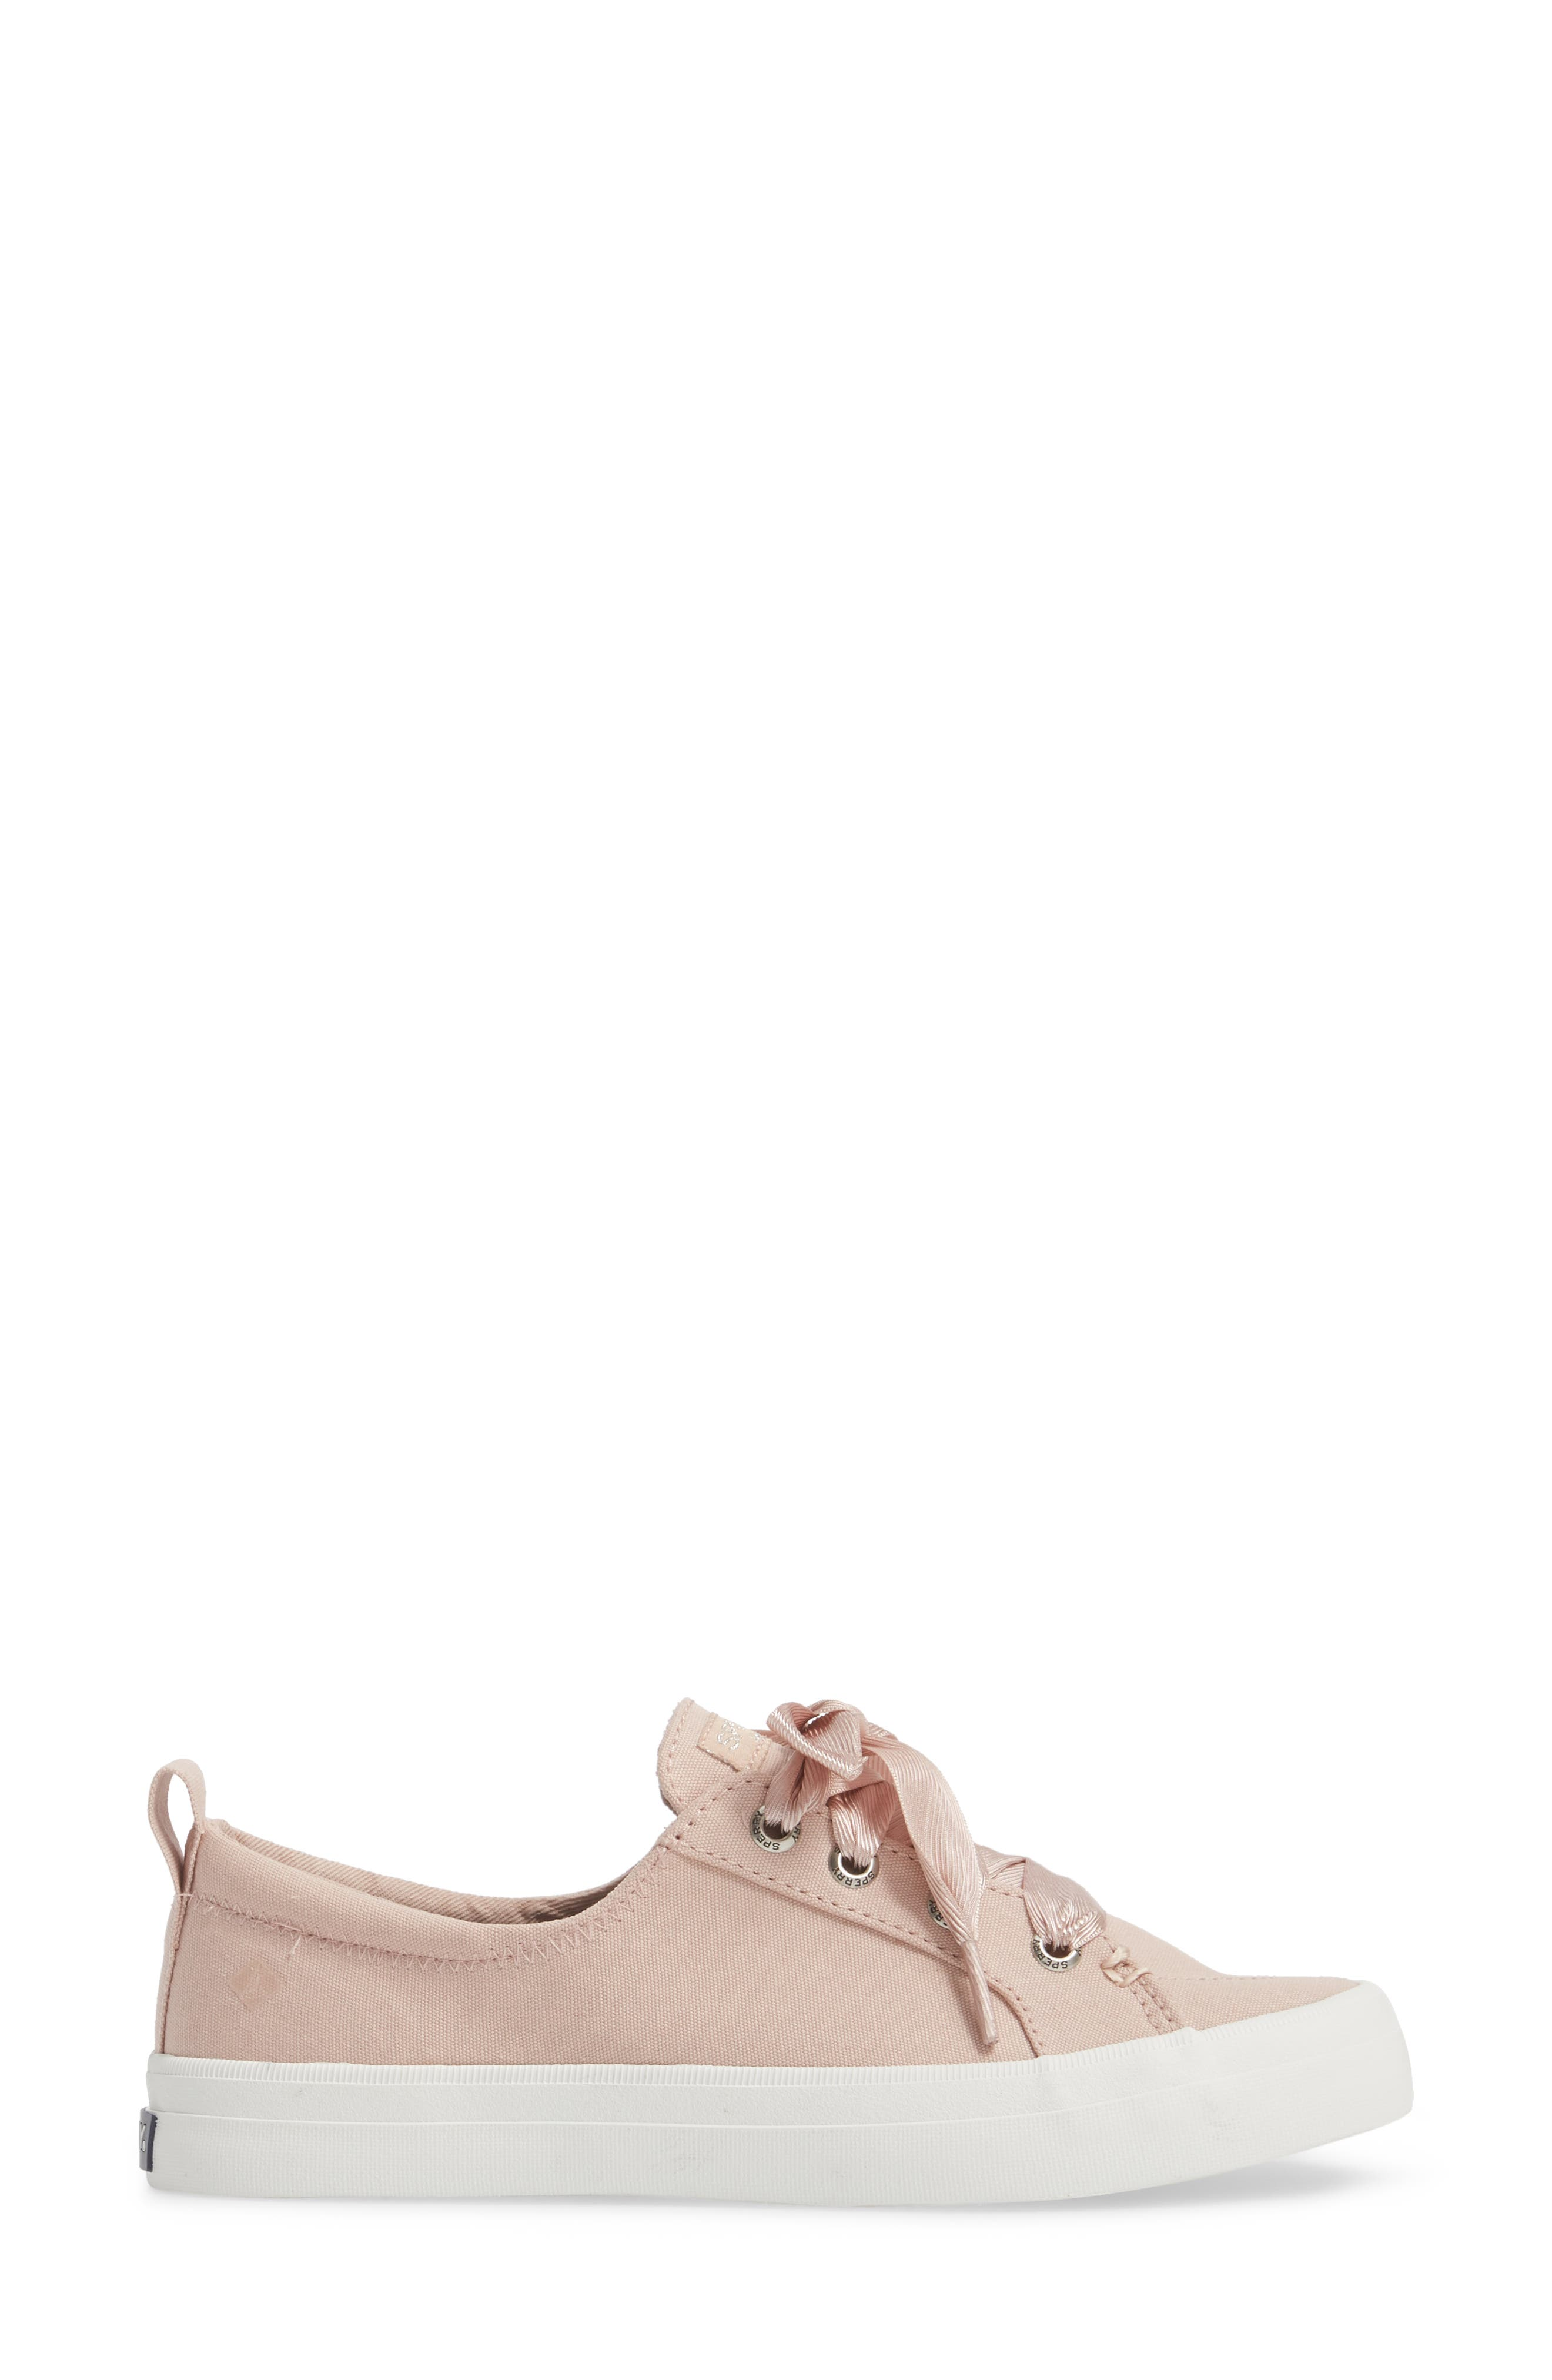 Crest Vibe Satin Lace Sneaker,                             Alternate thumbnail 9, color,